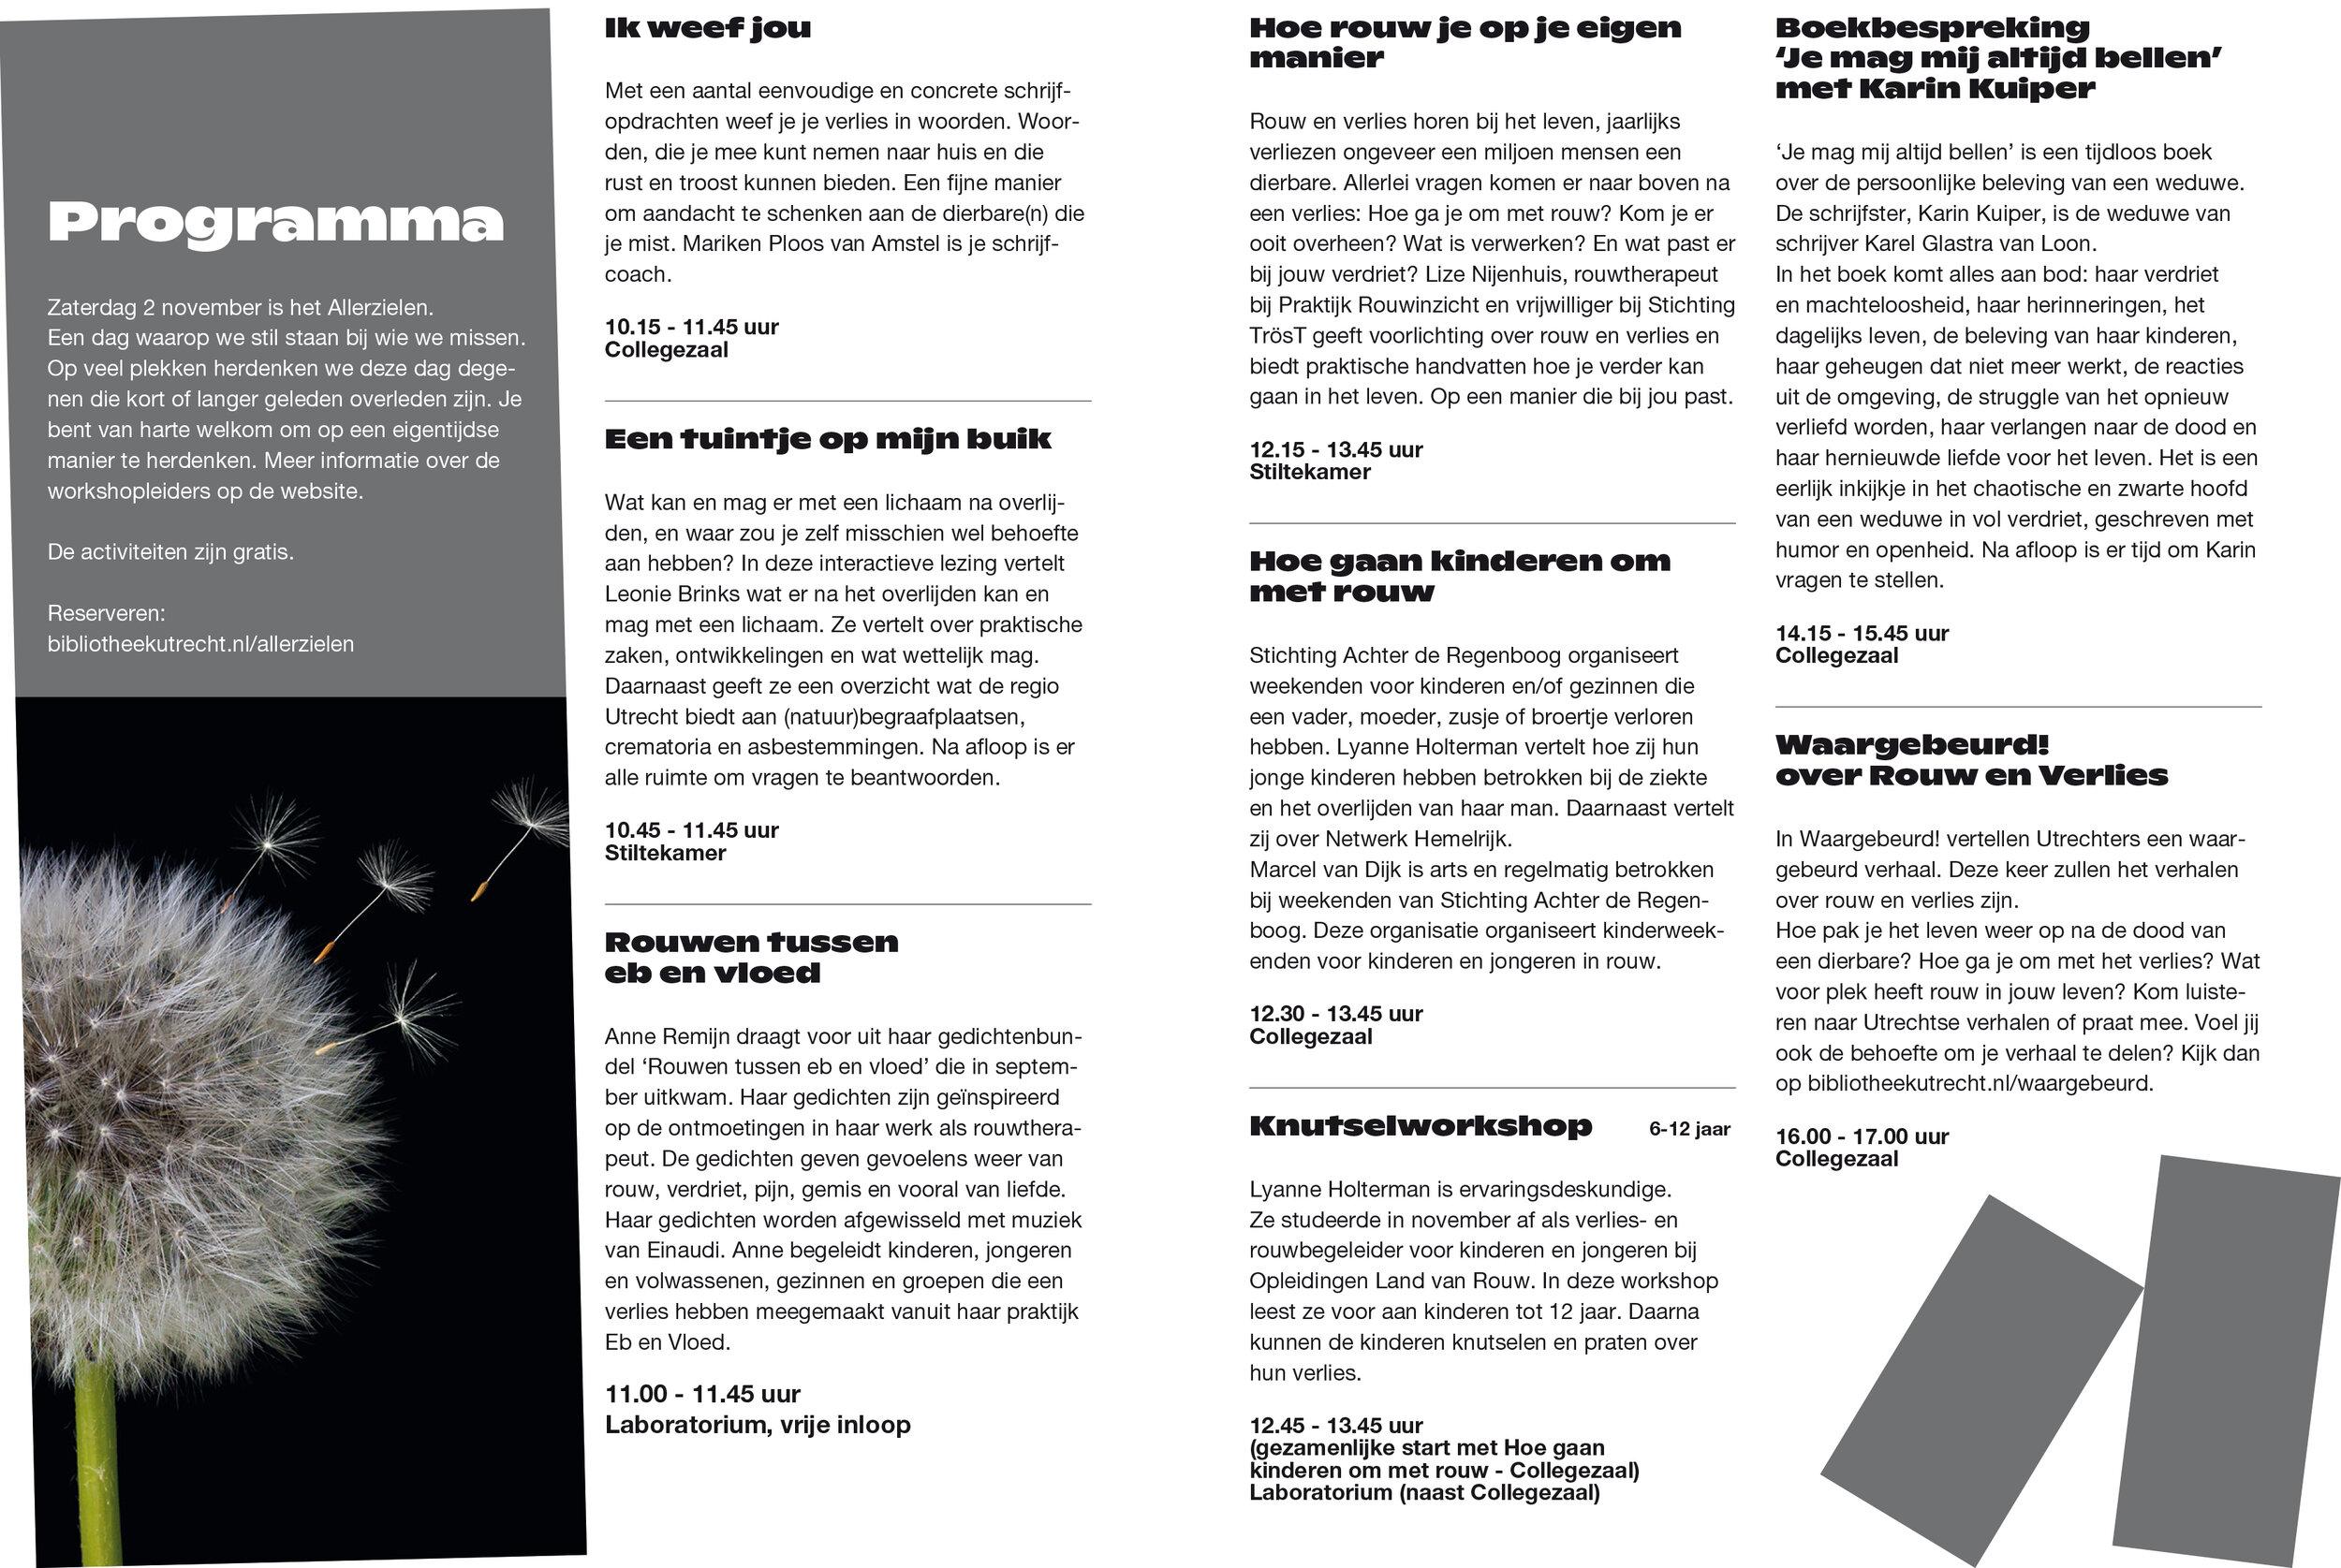 Allerzielen 2019 Centrale Bibliotheek Utrecht